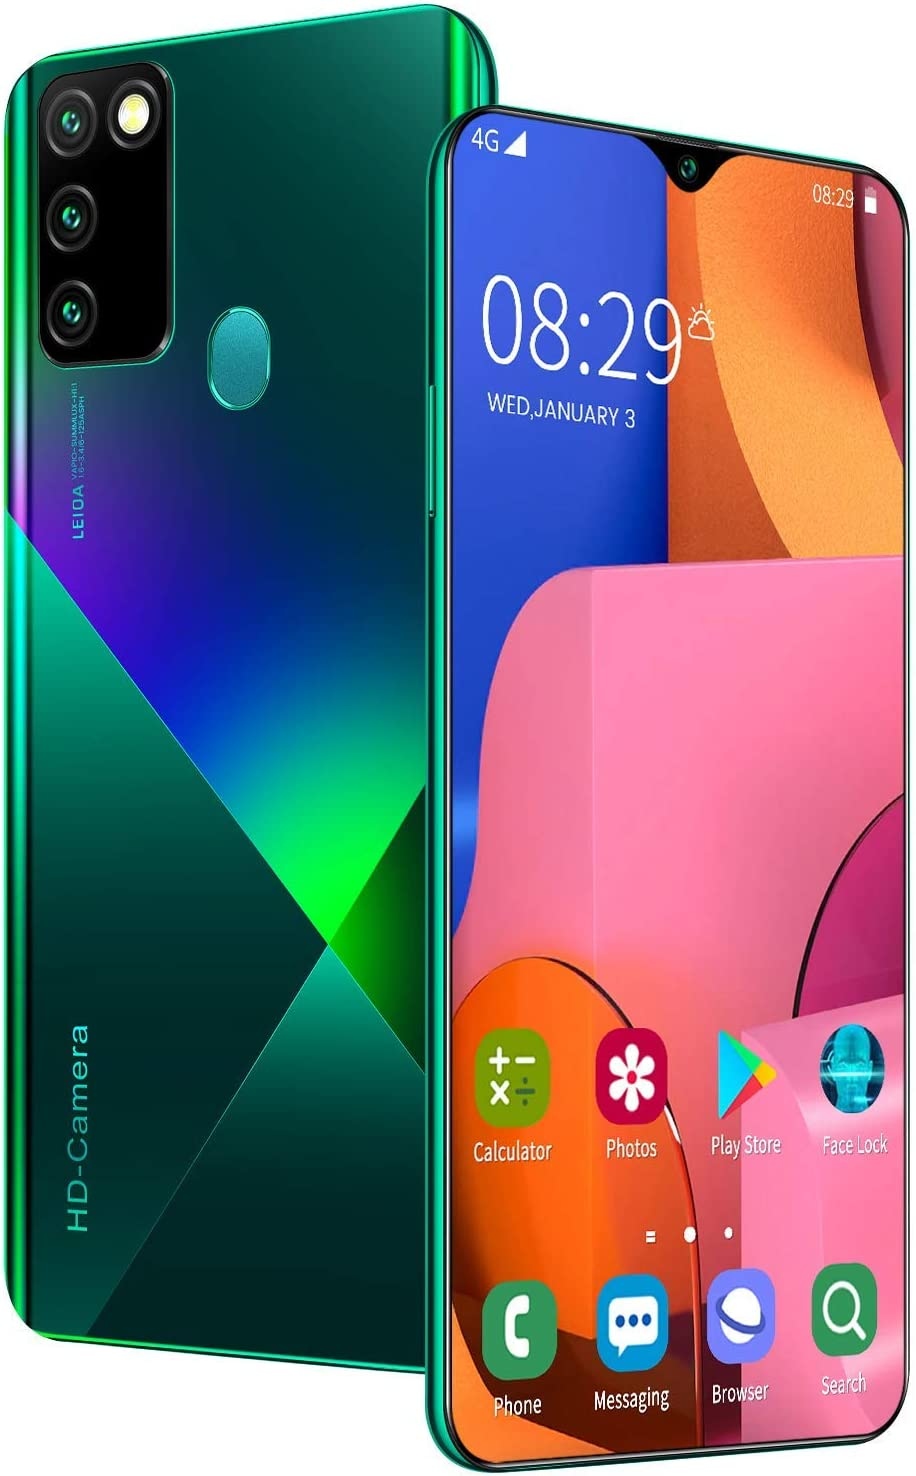 Mobile Phone A90 Smartphone SIM Free Android 10.0 Phones Unlocked, 6.8 inches Waterdrop Full-Screen 16MP + 32MP 4500mAh Battery Dual Camera Dual SIM